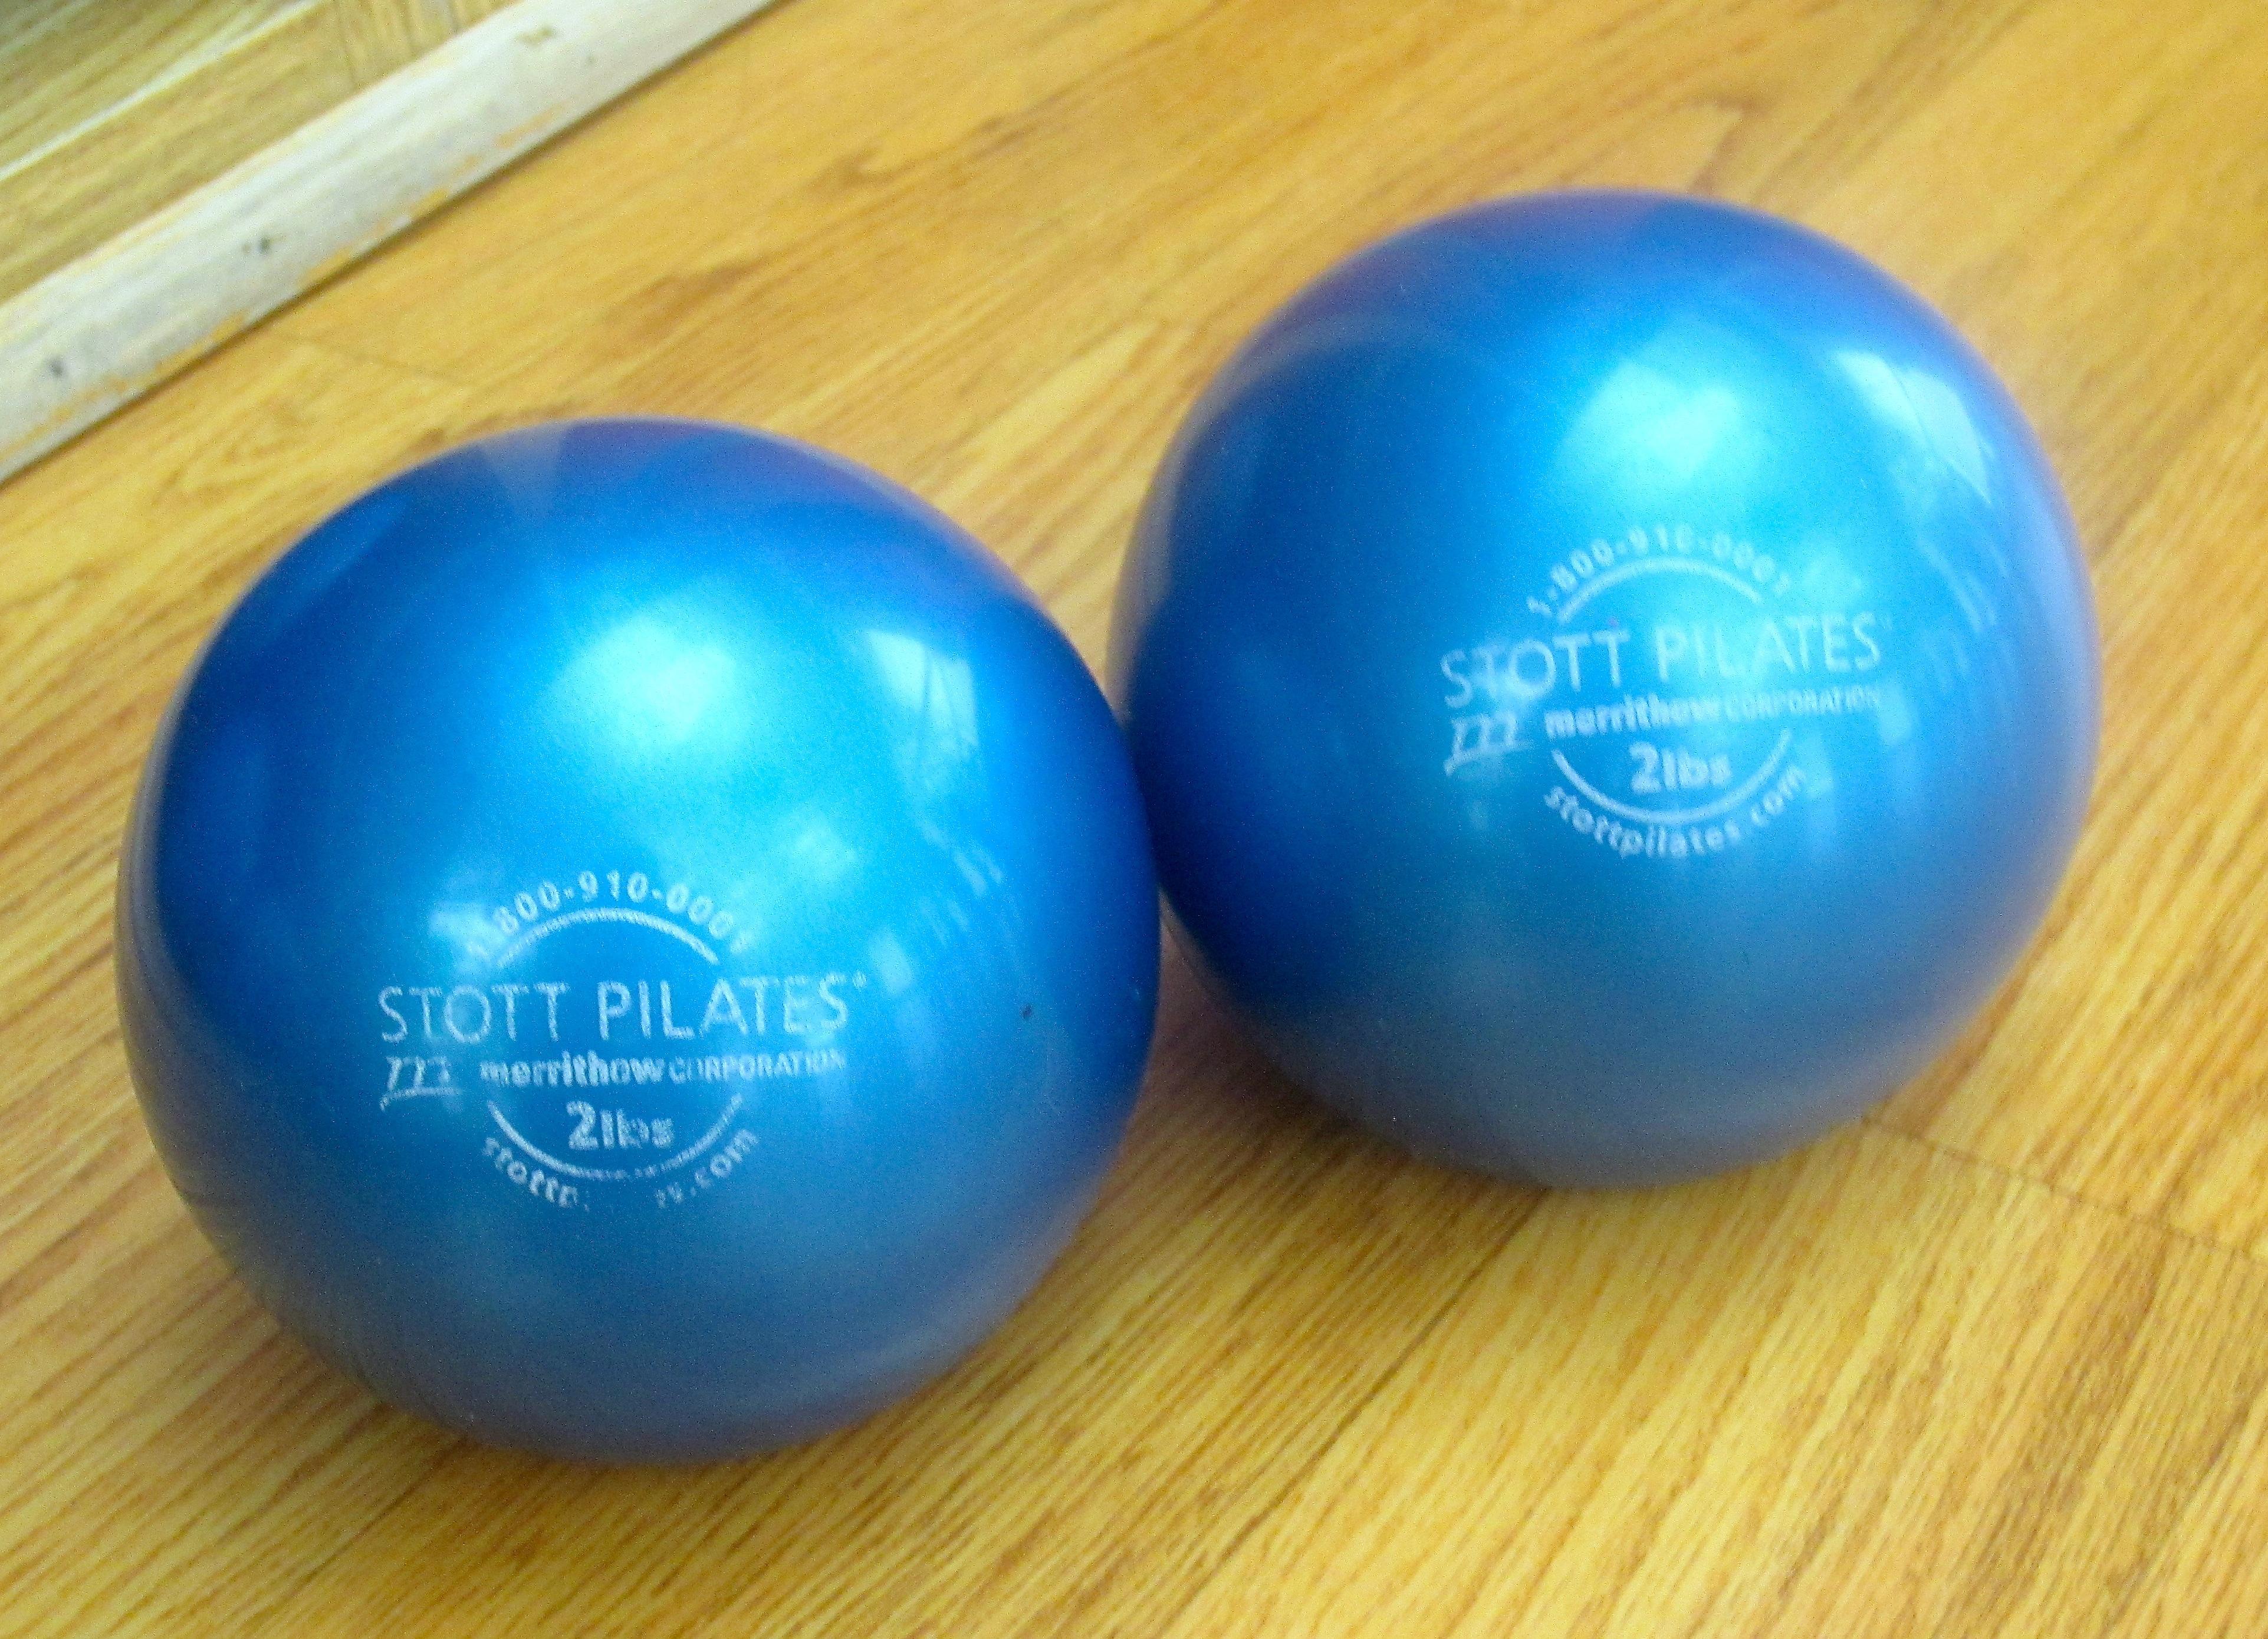 Stott pilates weights